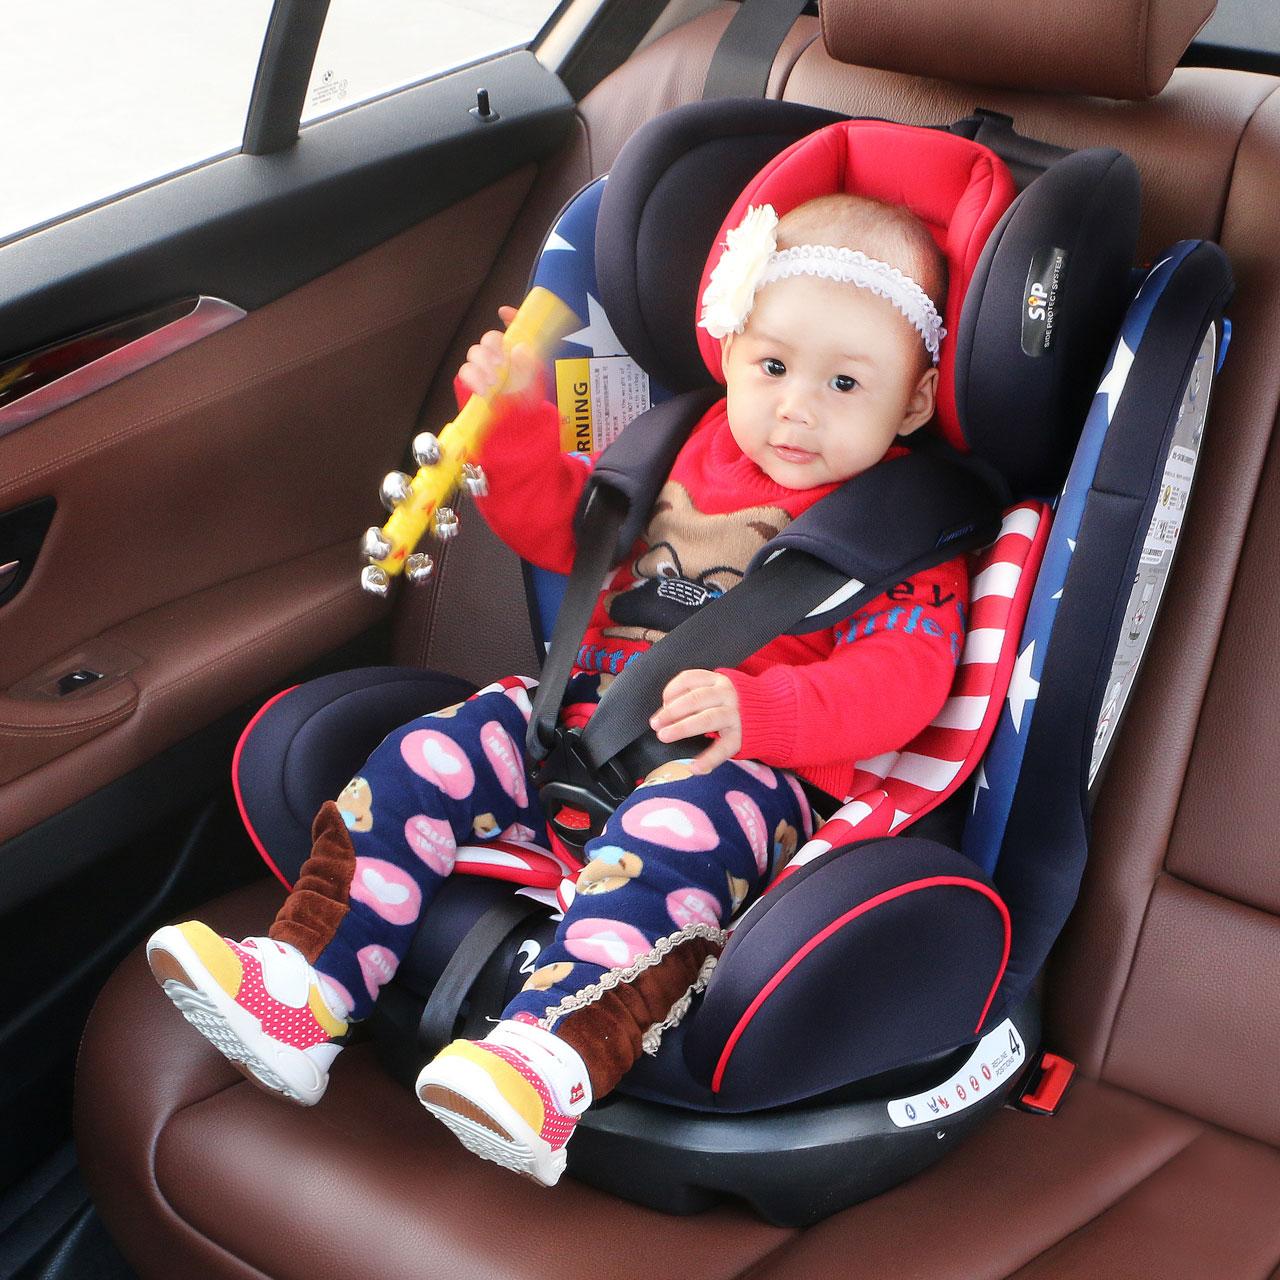 REEBABY儿童安全座椅汽车用0-12岁宝宝婴儿新生儿车载通用可躺坐